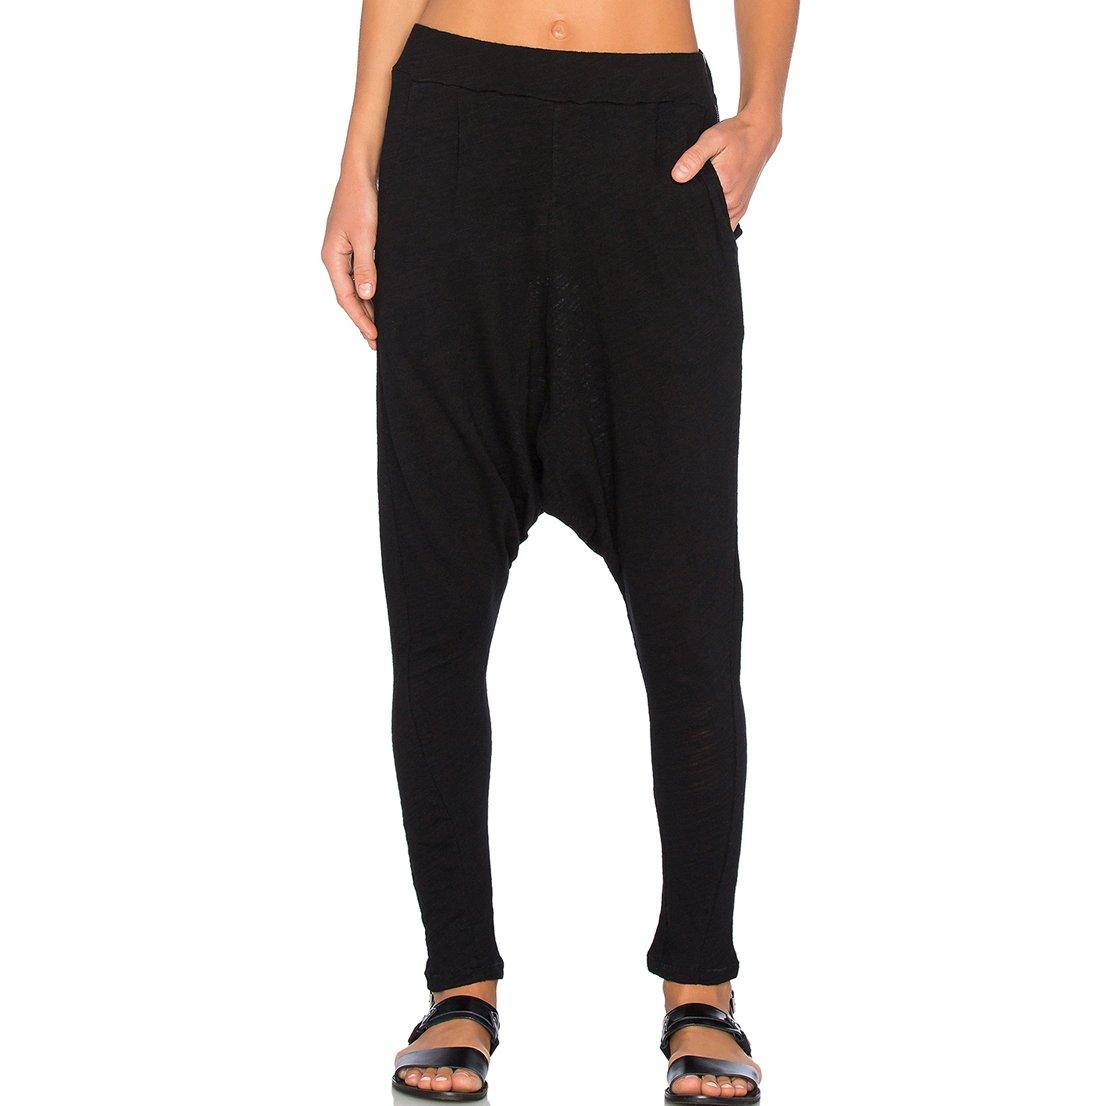 May&Maya Women's Black Harem Pants (S)